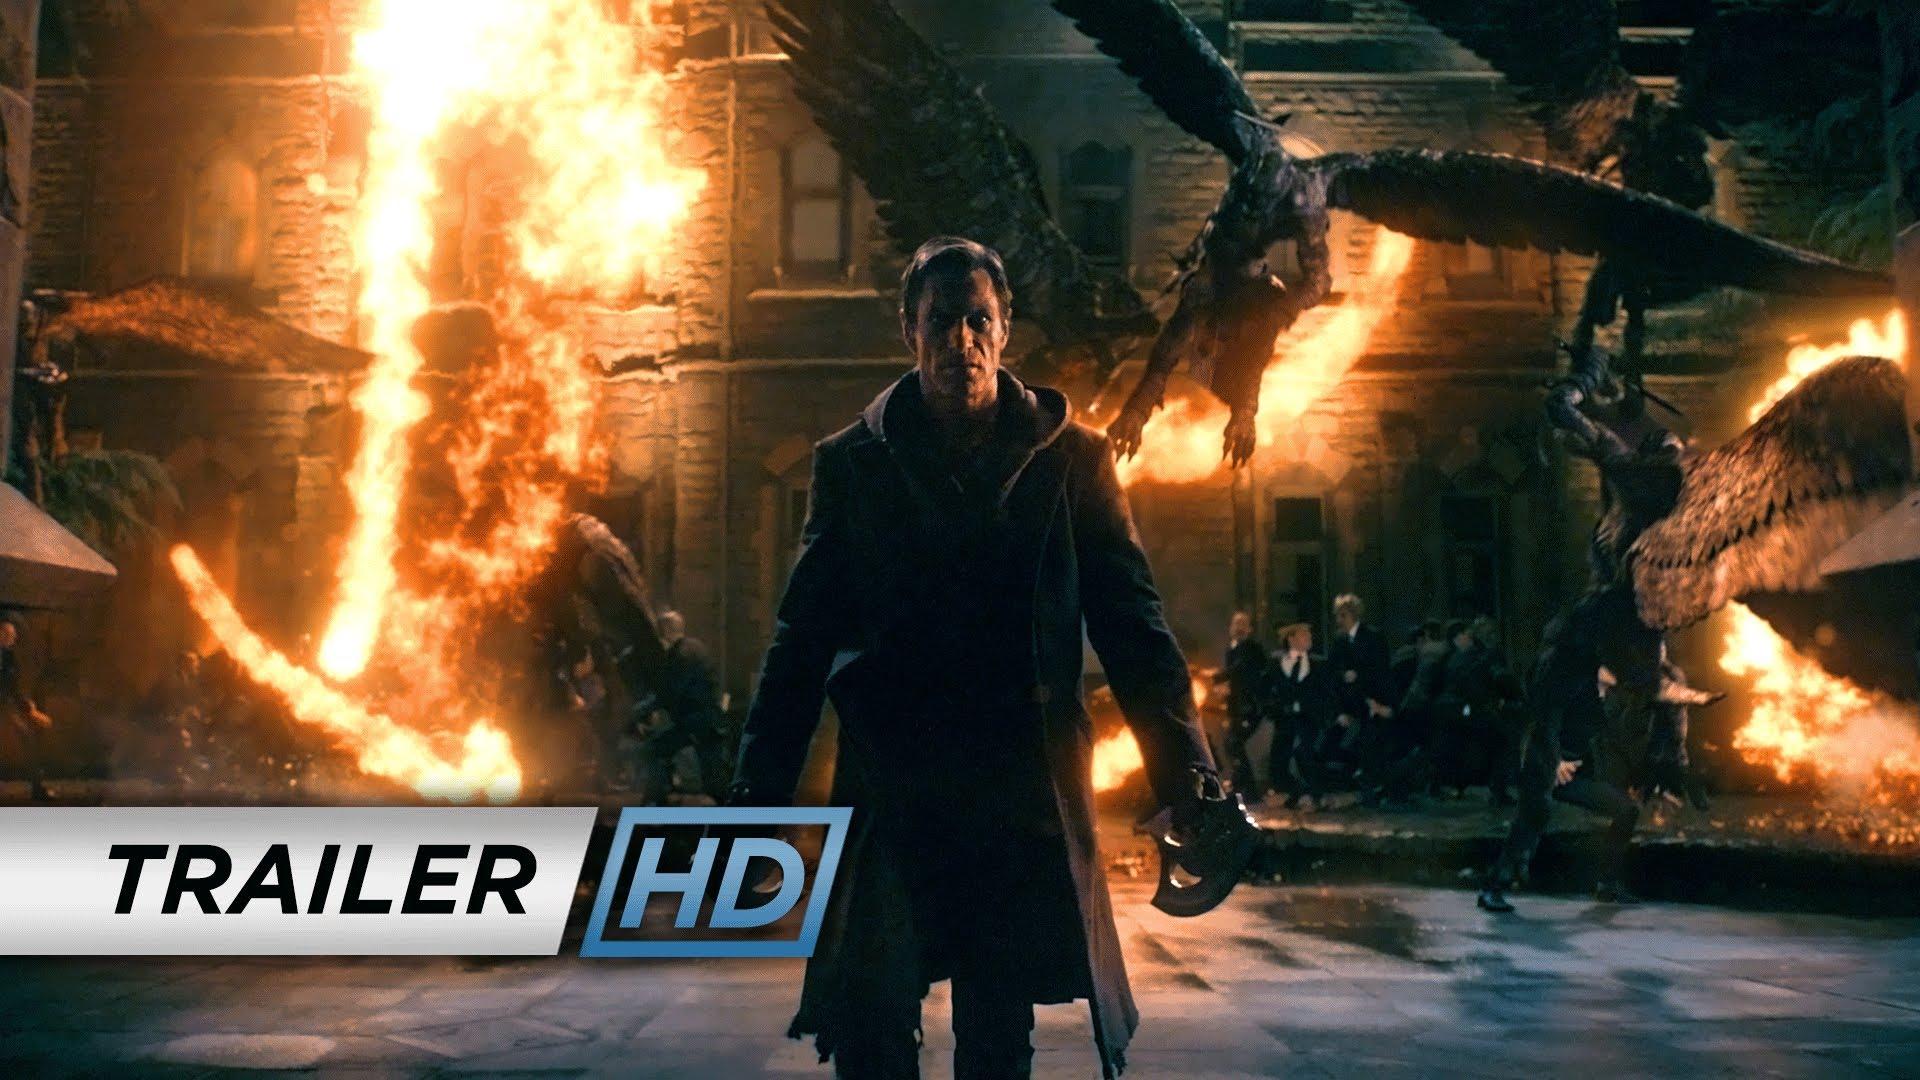 [Movie Review] I, FRANKENSTEIN 3D - Alvinology